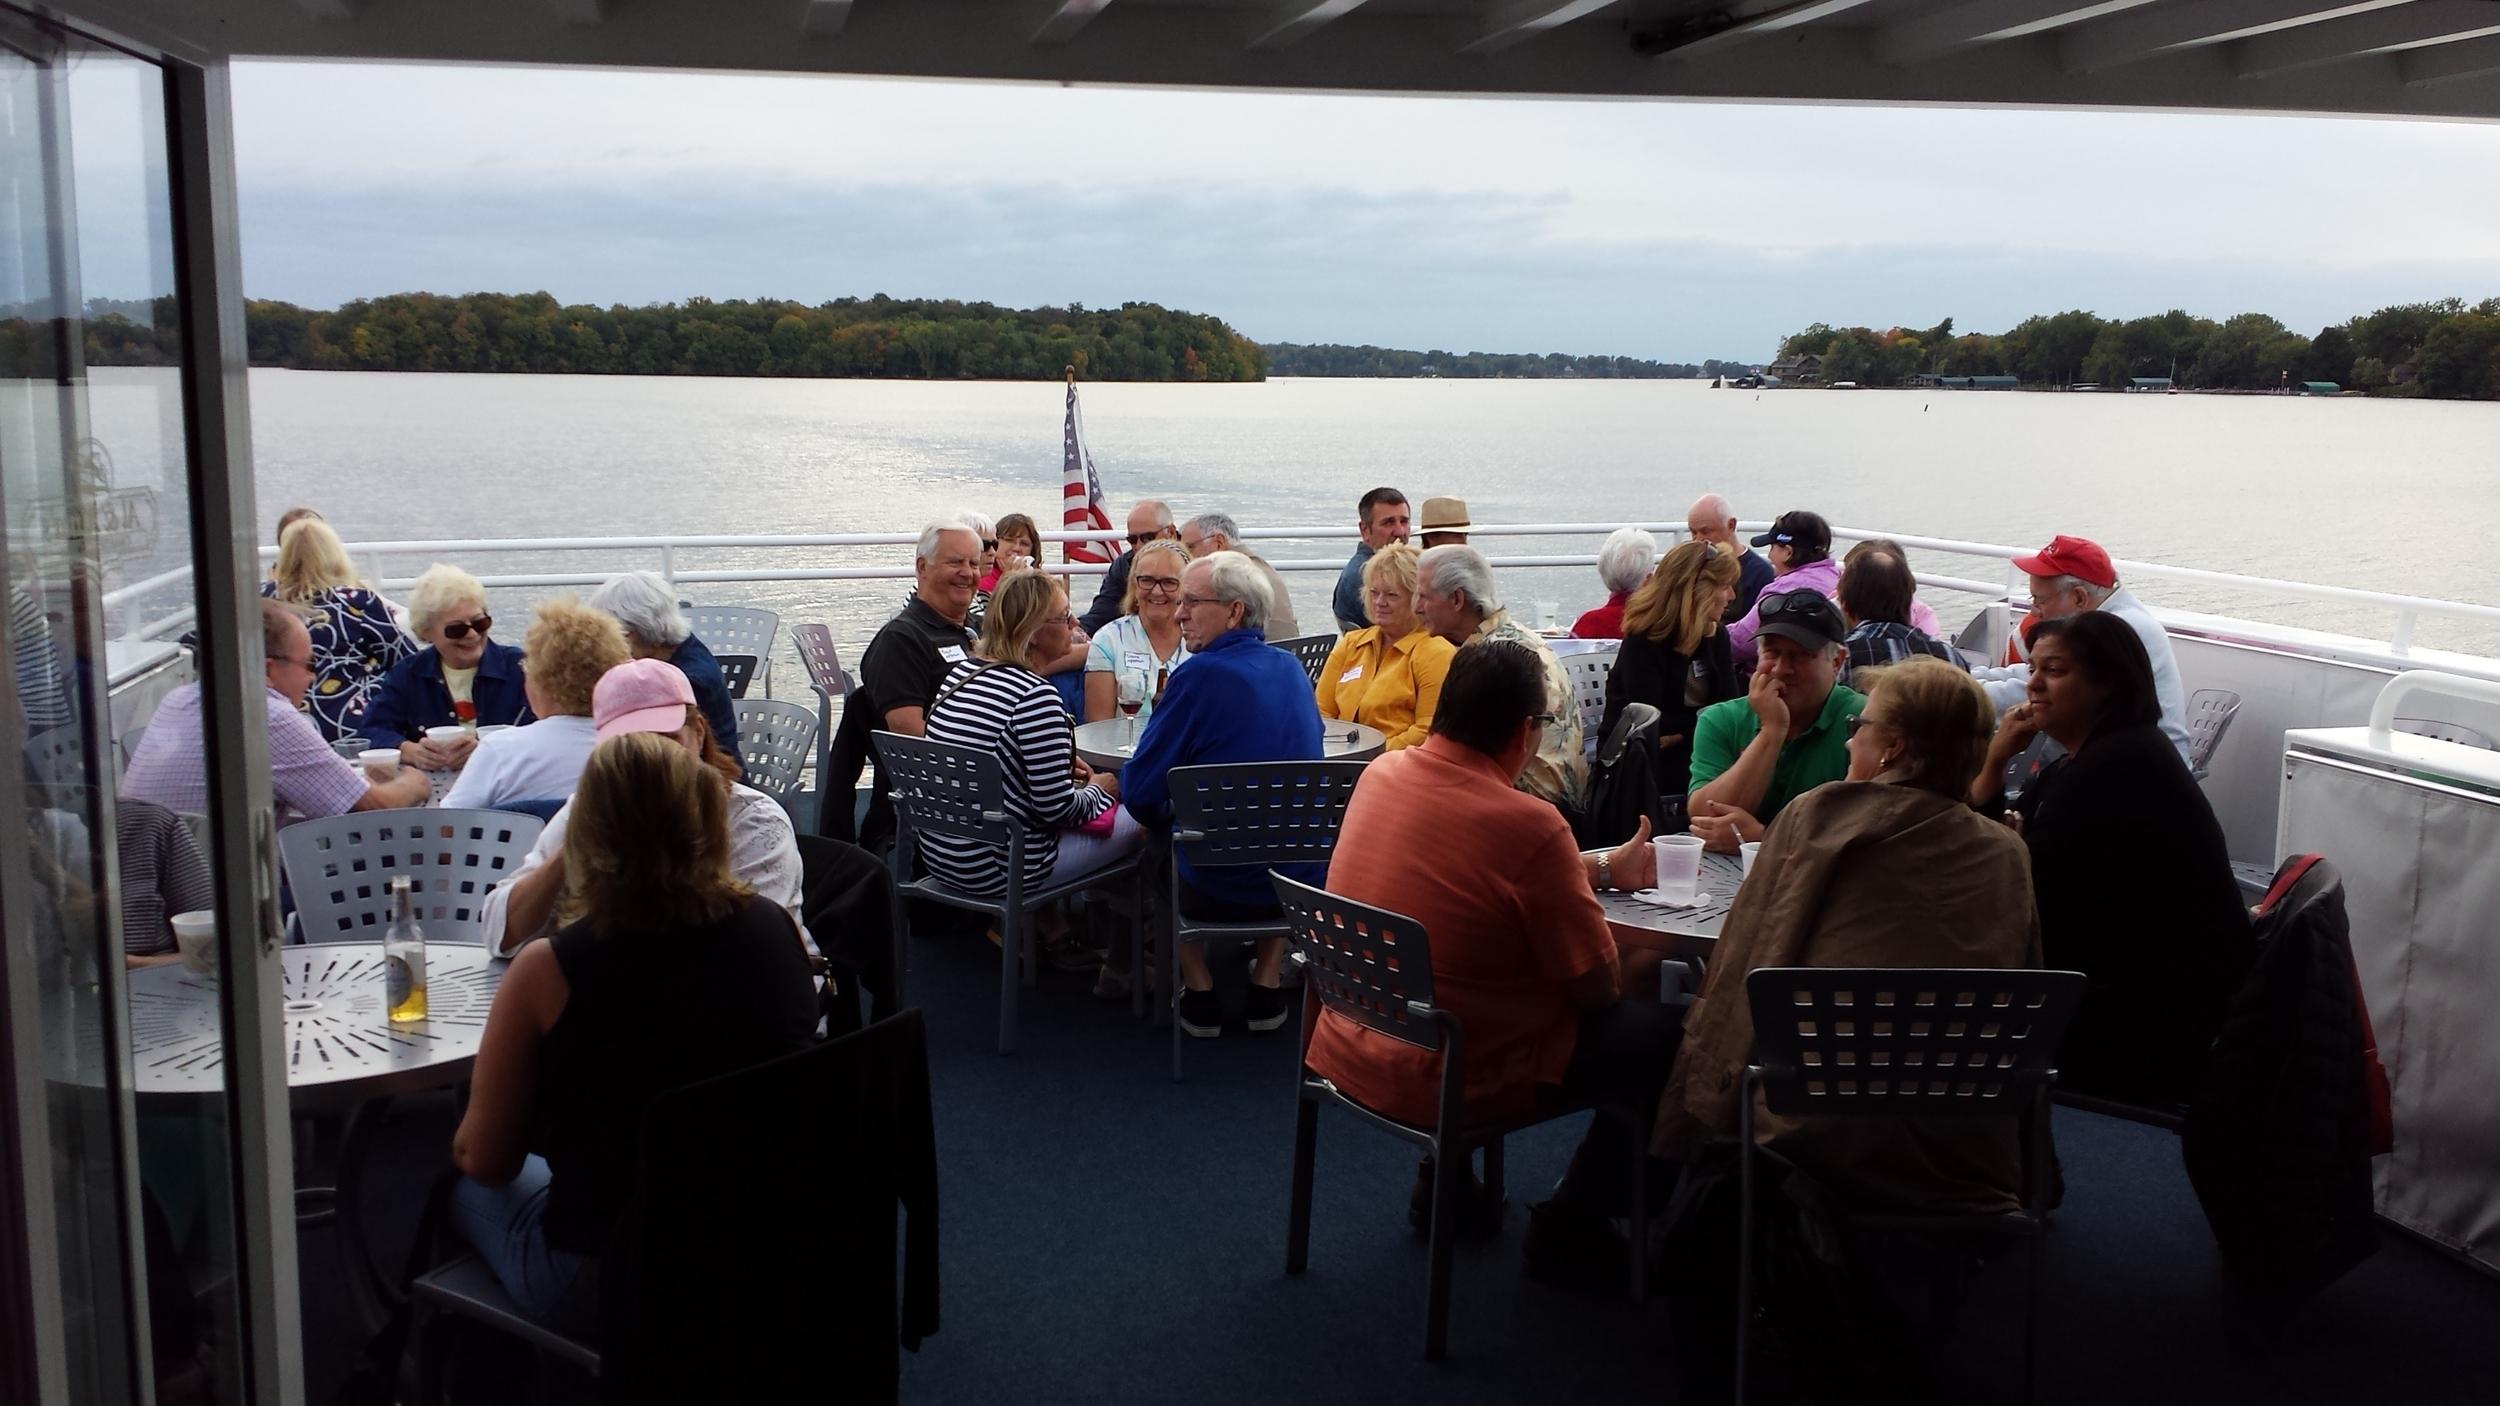 2014 Fall Colors Boat Cruise on Lake Minnetonka